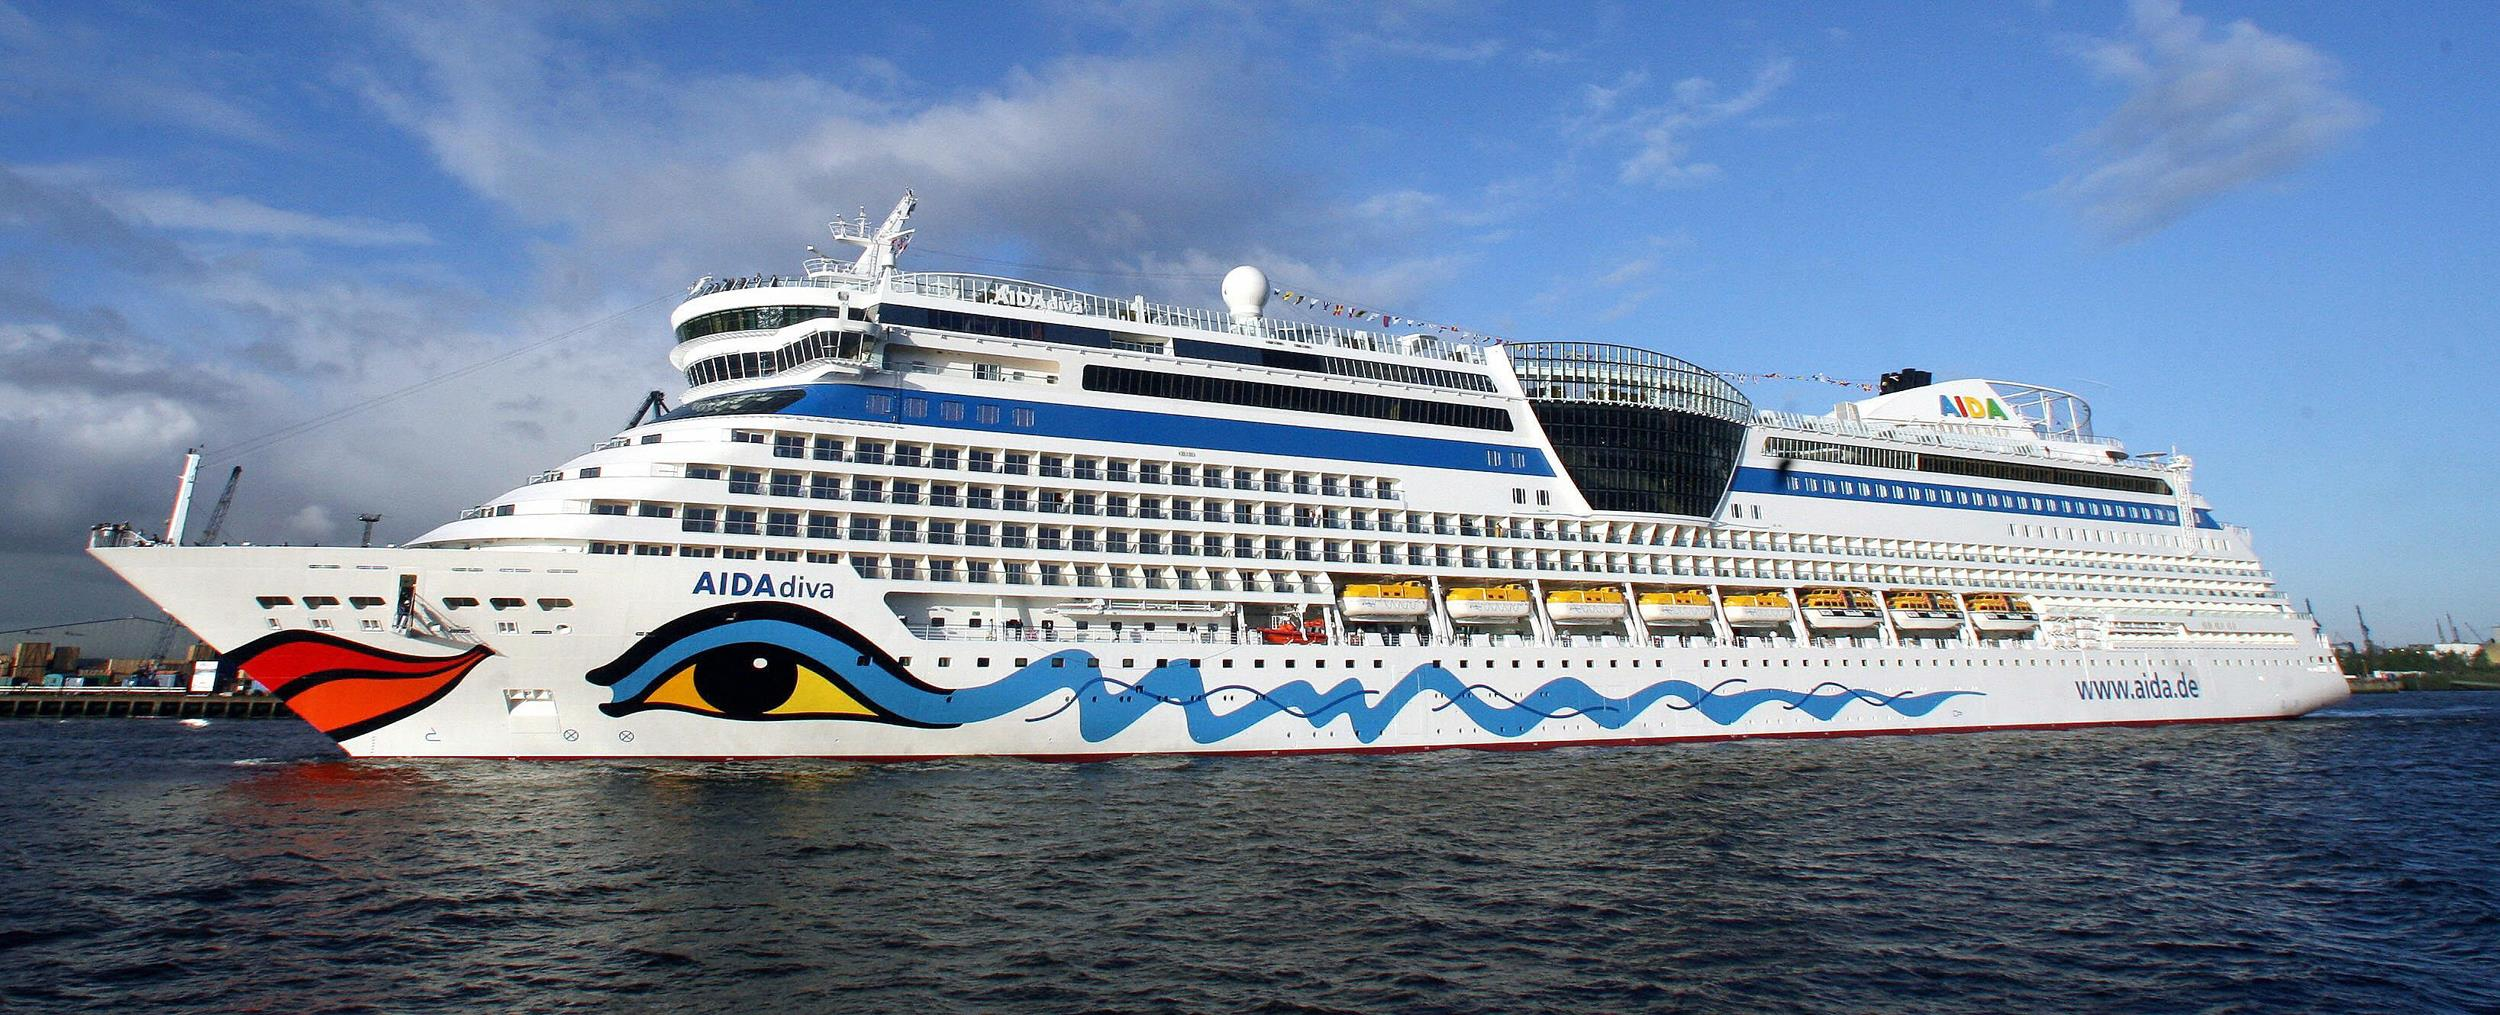 AIDAdiva cruise ship